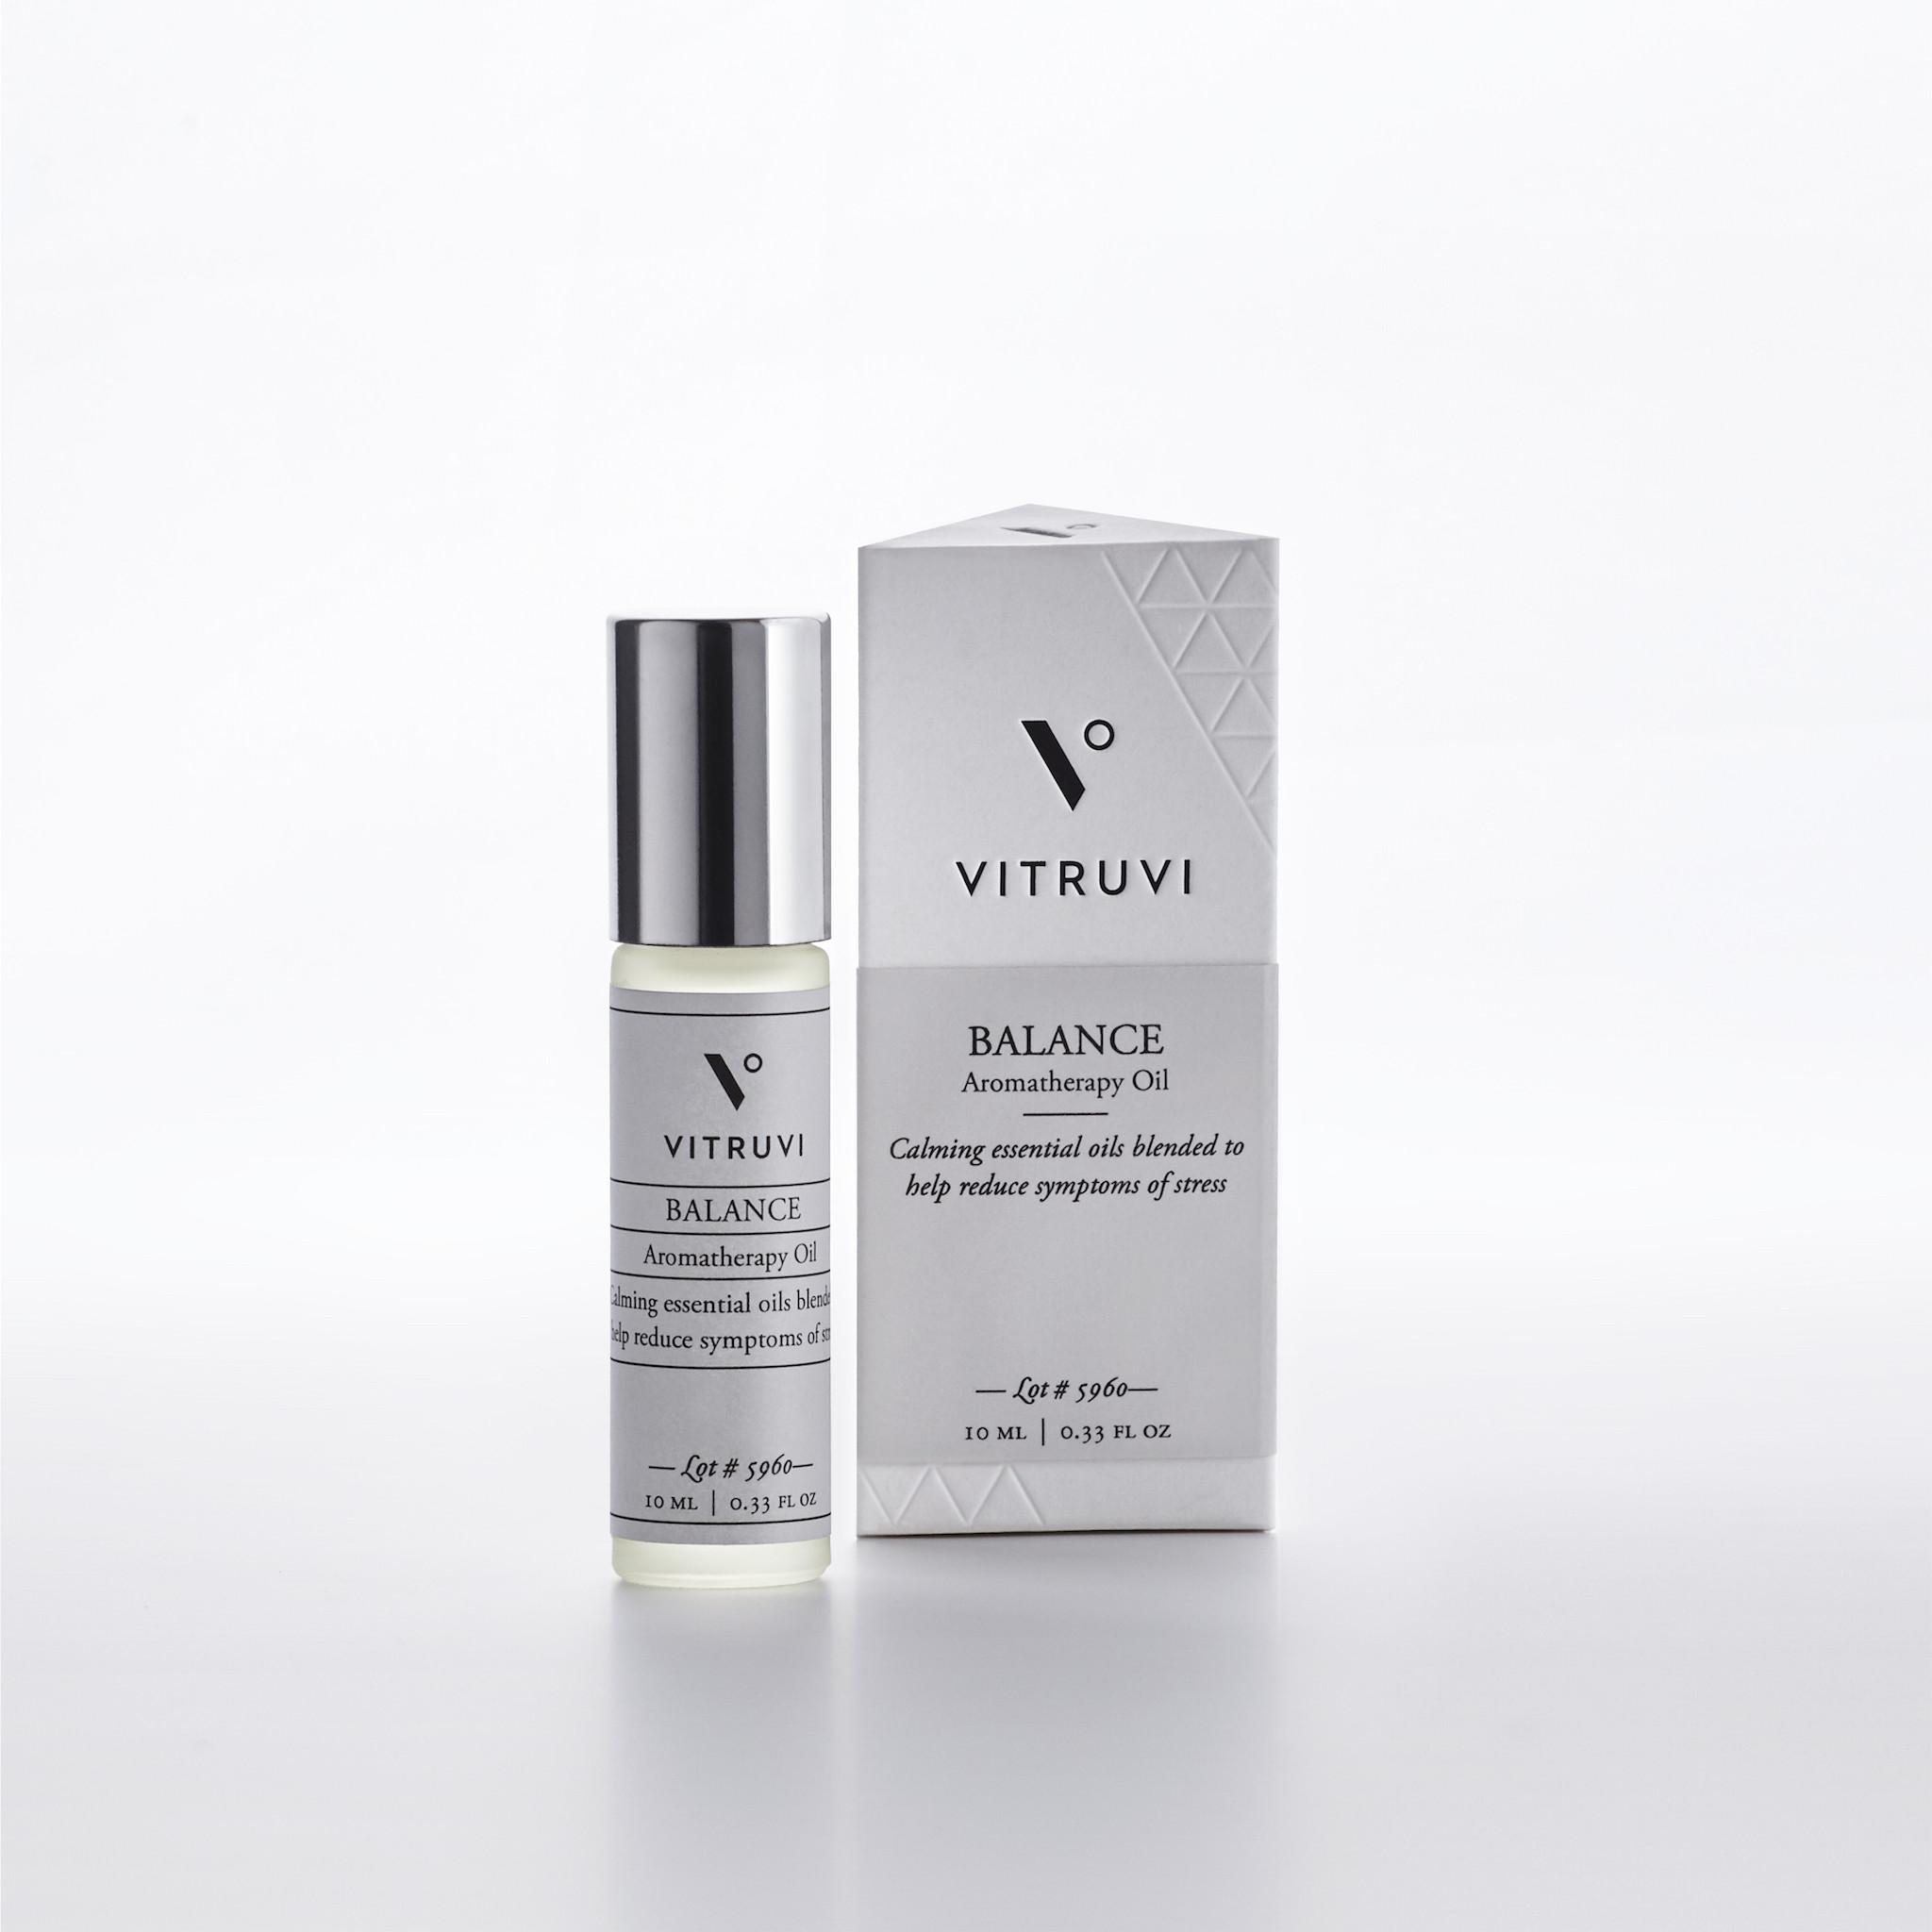 Balance // Aromatherapy Oil